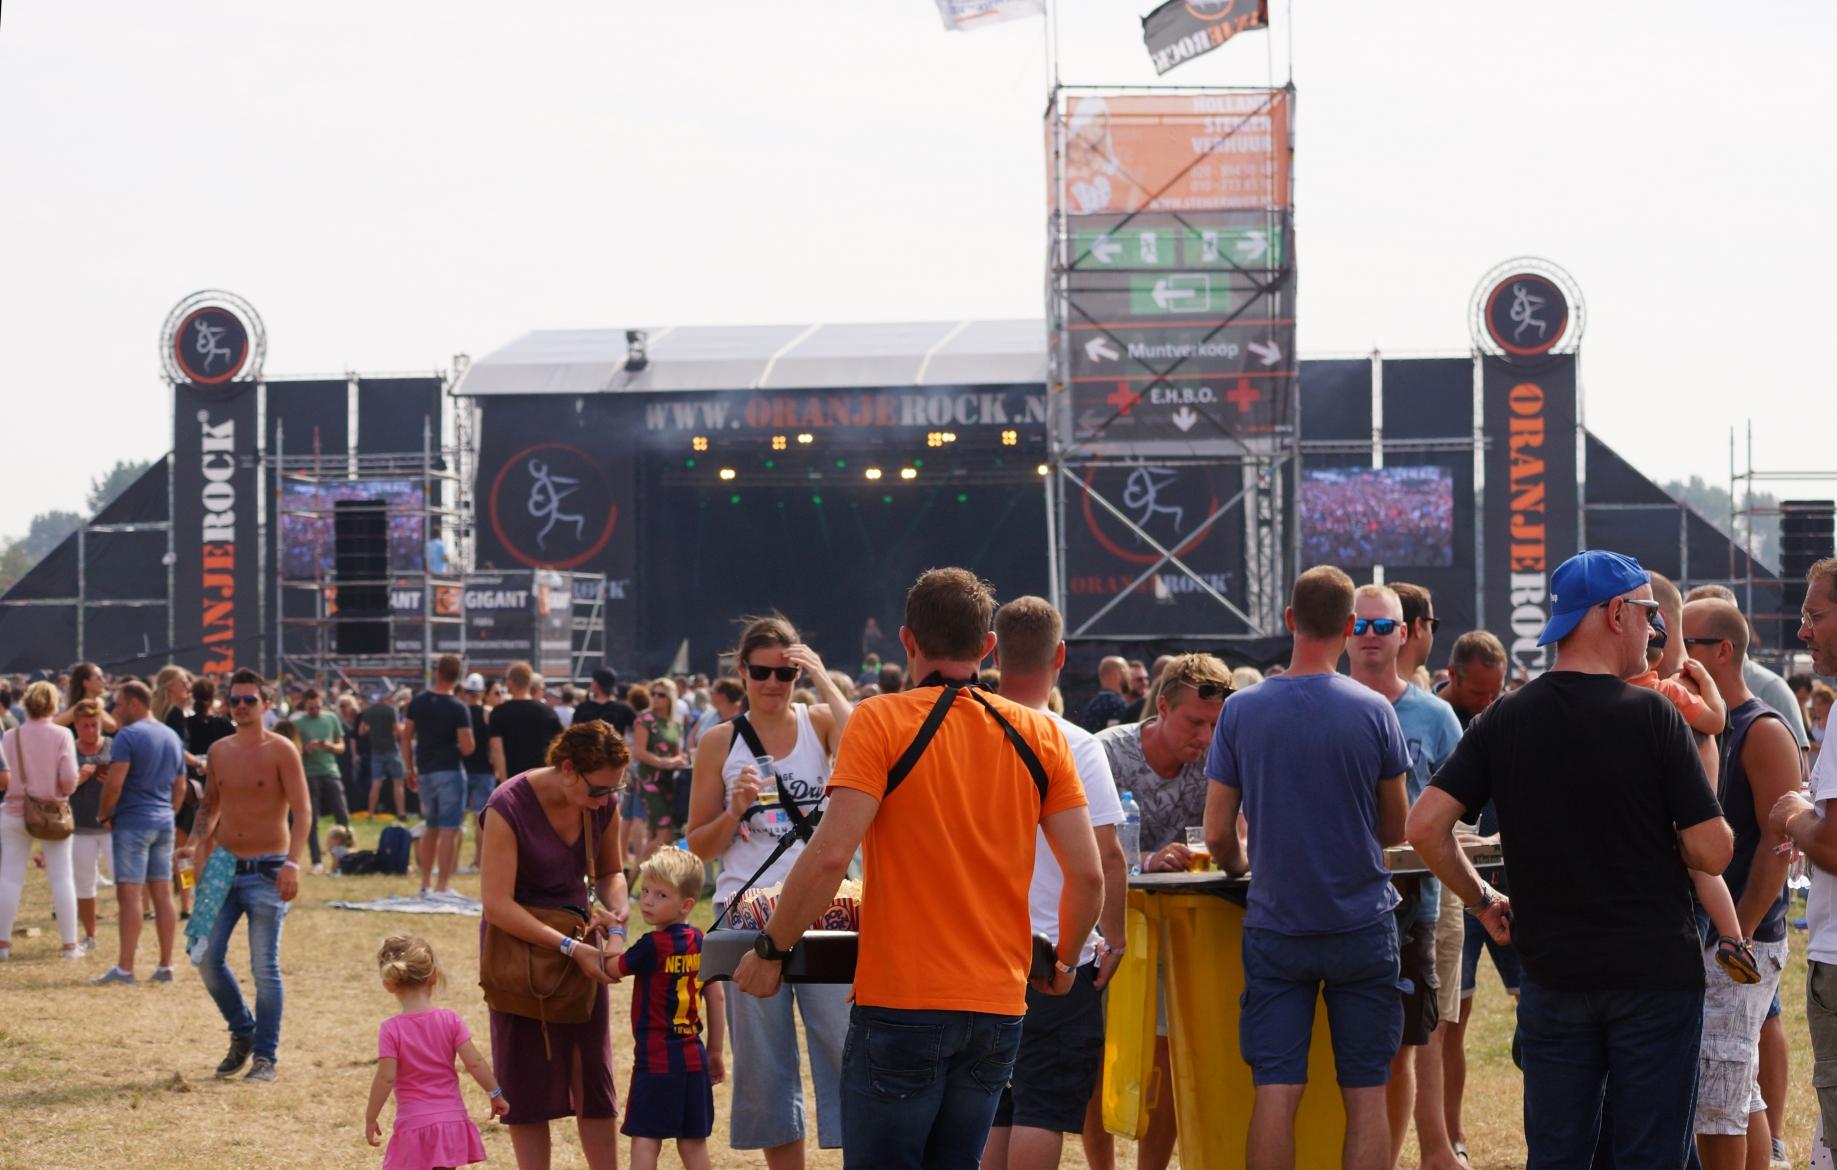 Poppin' festival vibes